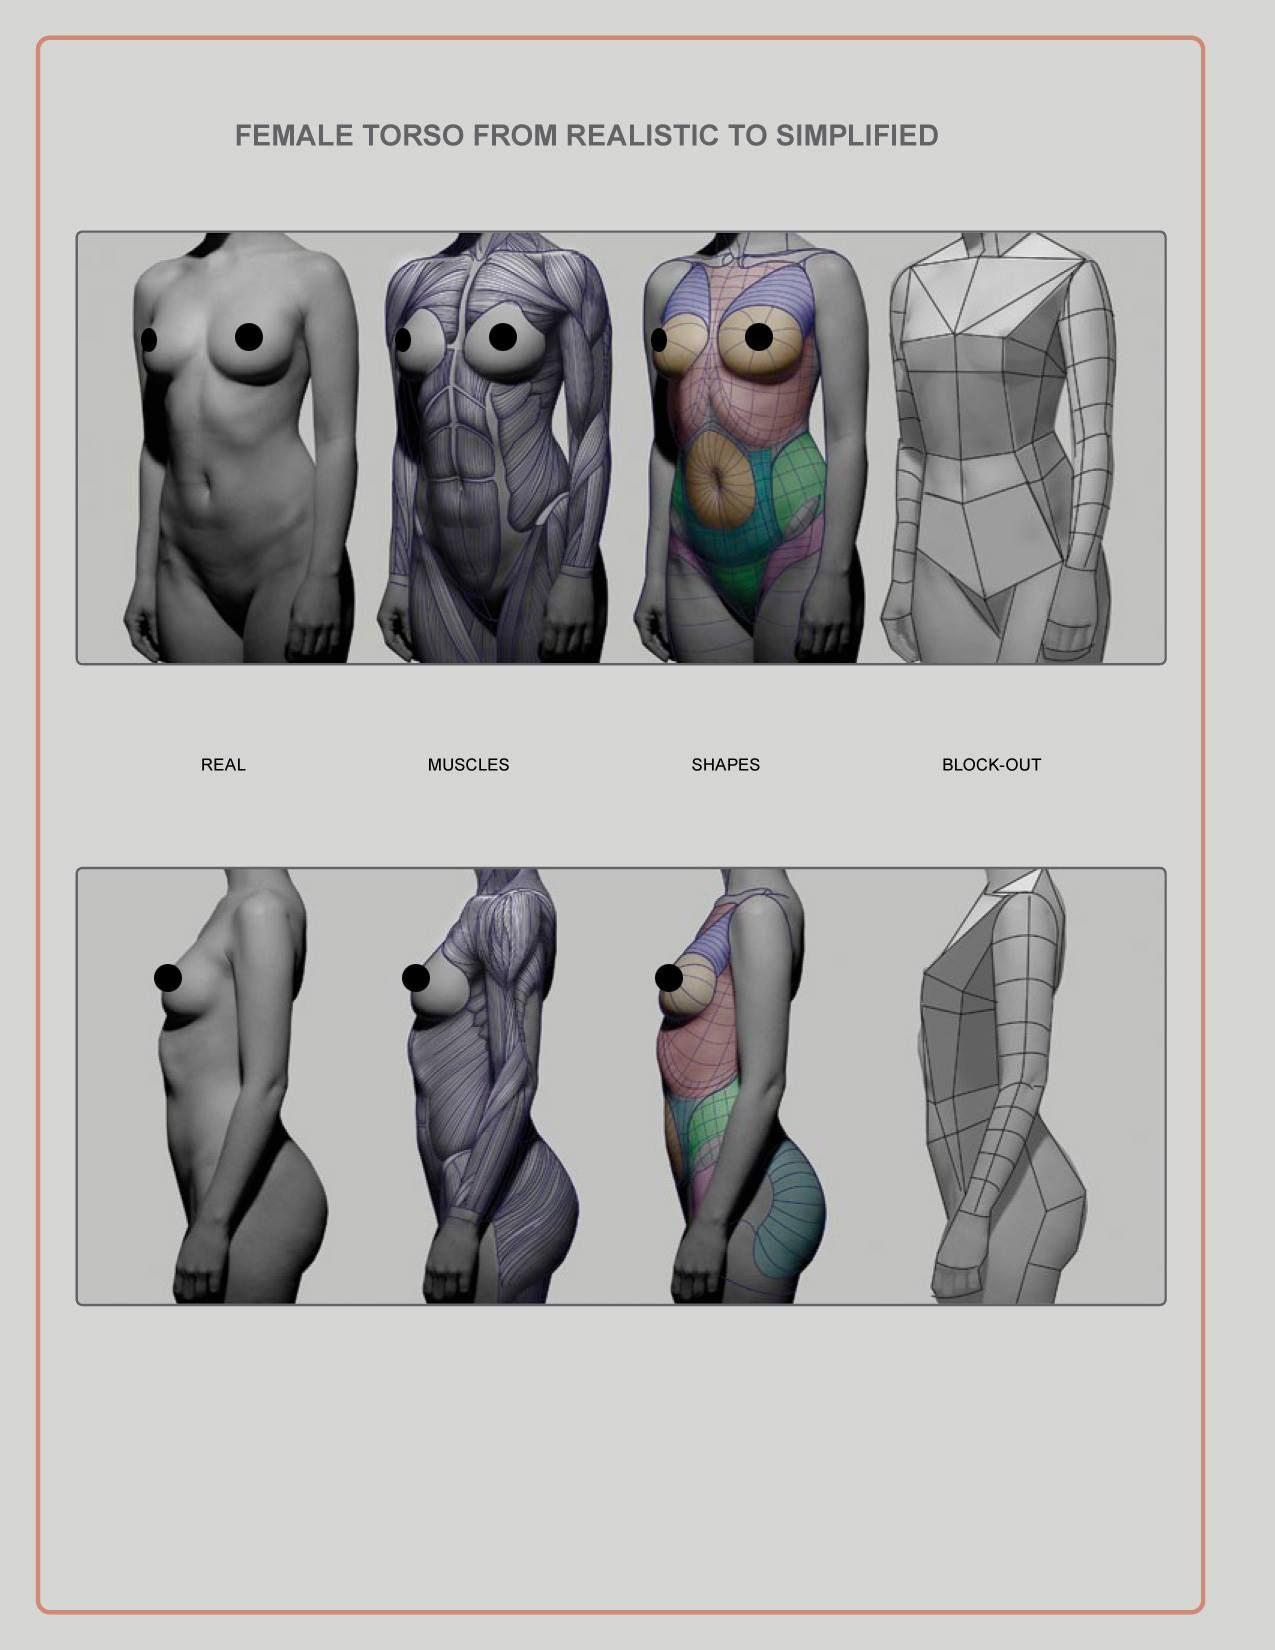 Pin By Fabian Schmidt On Anatomy Pinterest Anatomy Art Studios